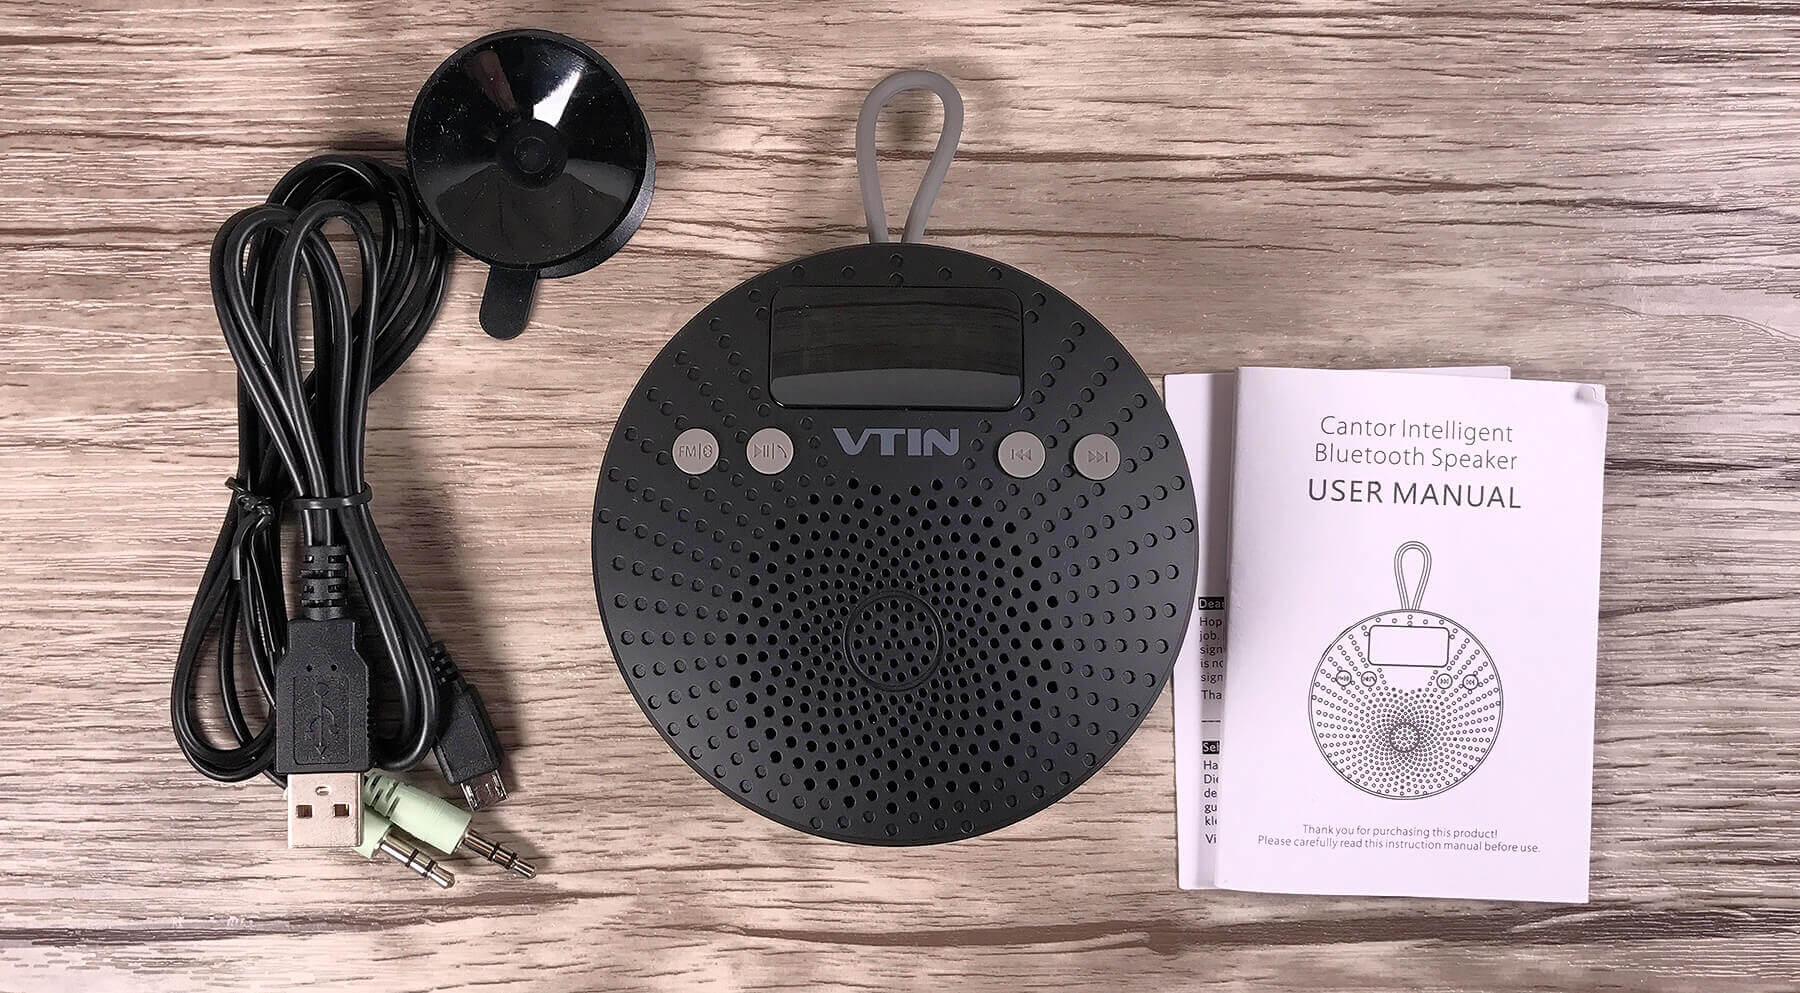 Full Size of Bluetooth Lautsprecher Dusche Im Test Victsing Cantor Wasserdichtes Duschradio Behindertengerechte Hsk Duschen Hüppe Bodengleiche Ebenerdige Grohe Glastür Dusche Bluetooth Lautsprecher Dusche